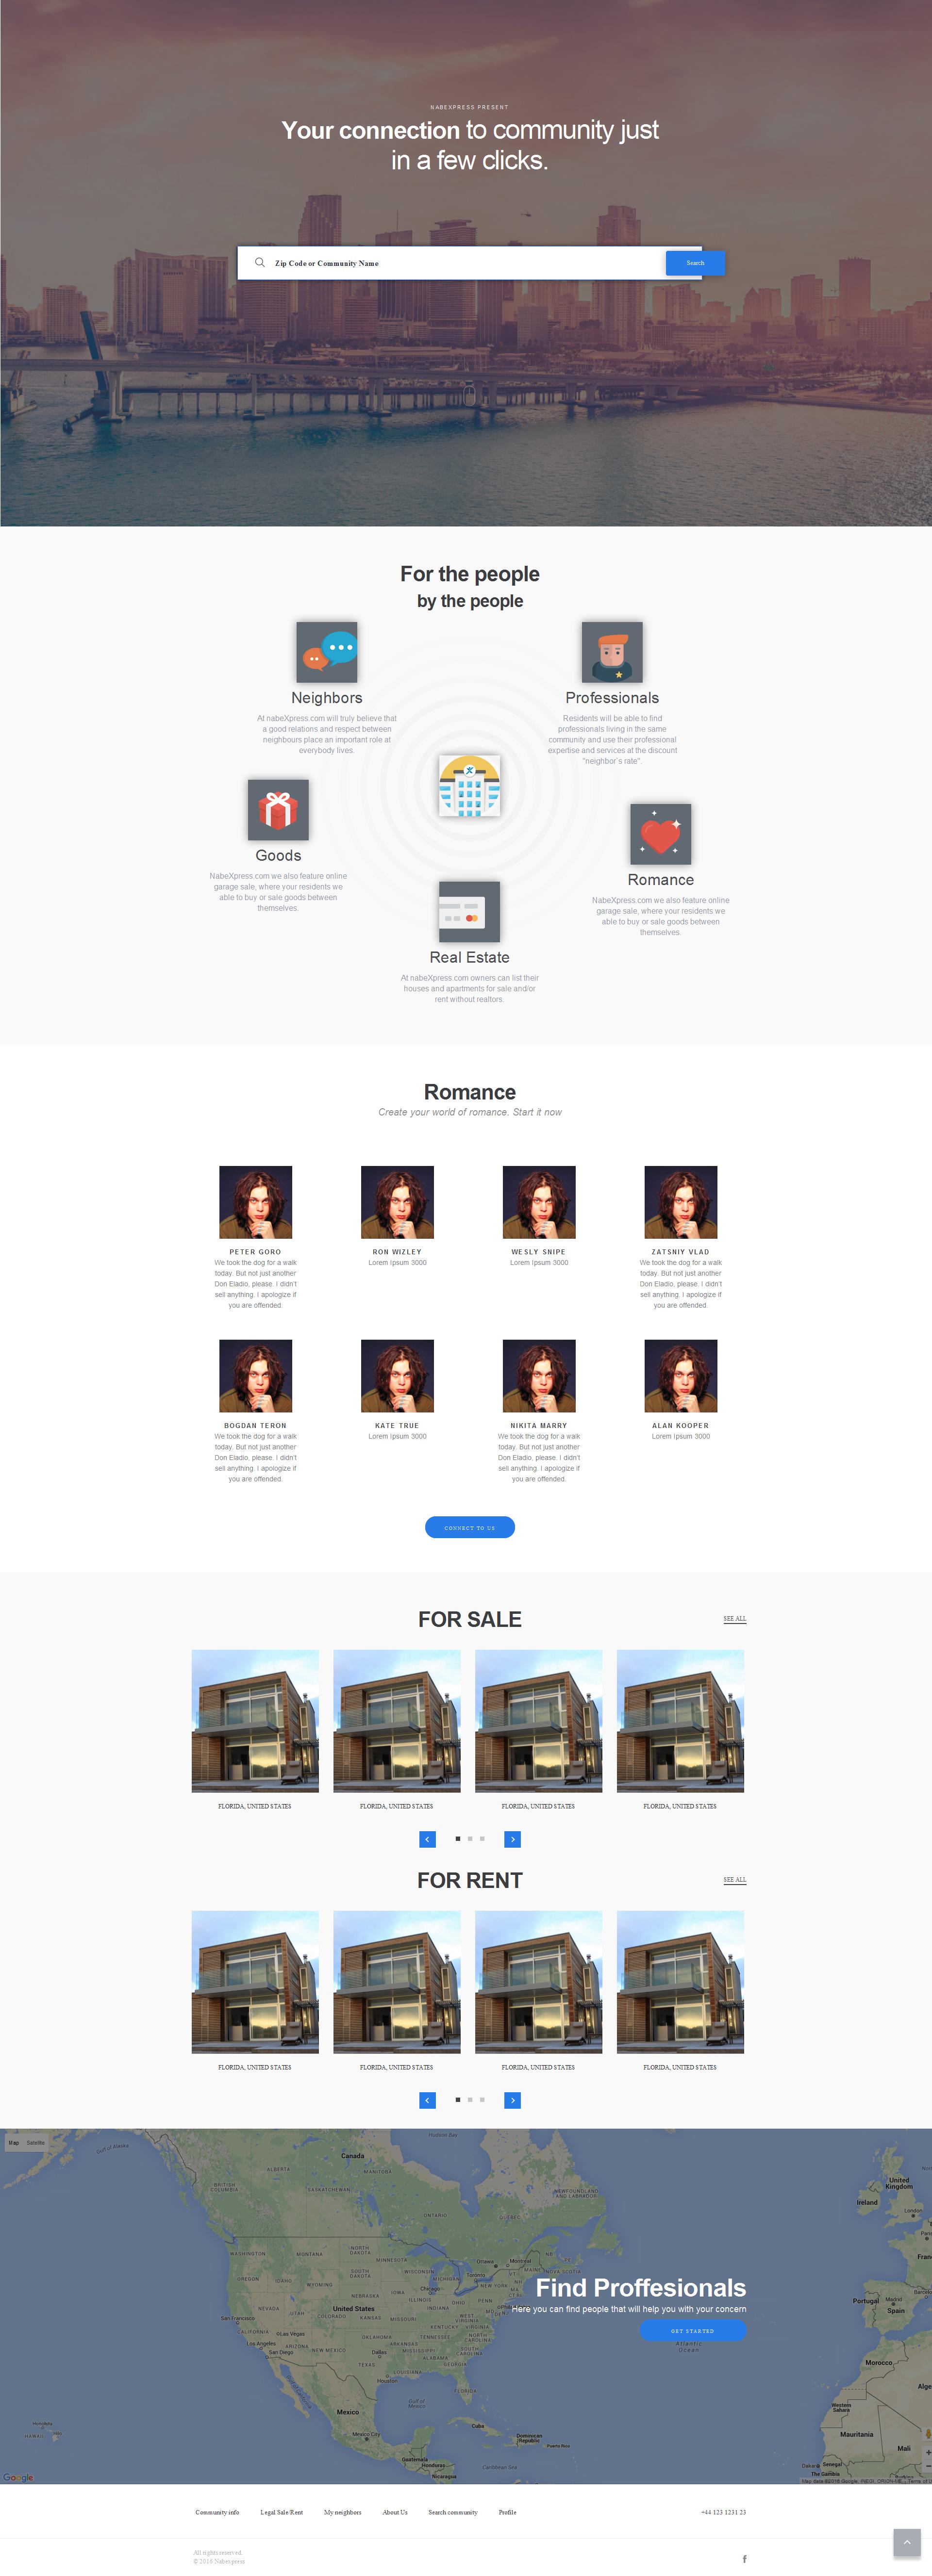 NabeXPress - Адаптивная верстка сервиса по поиску недвижимости